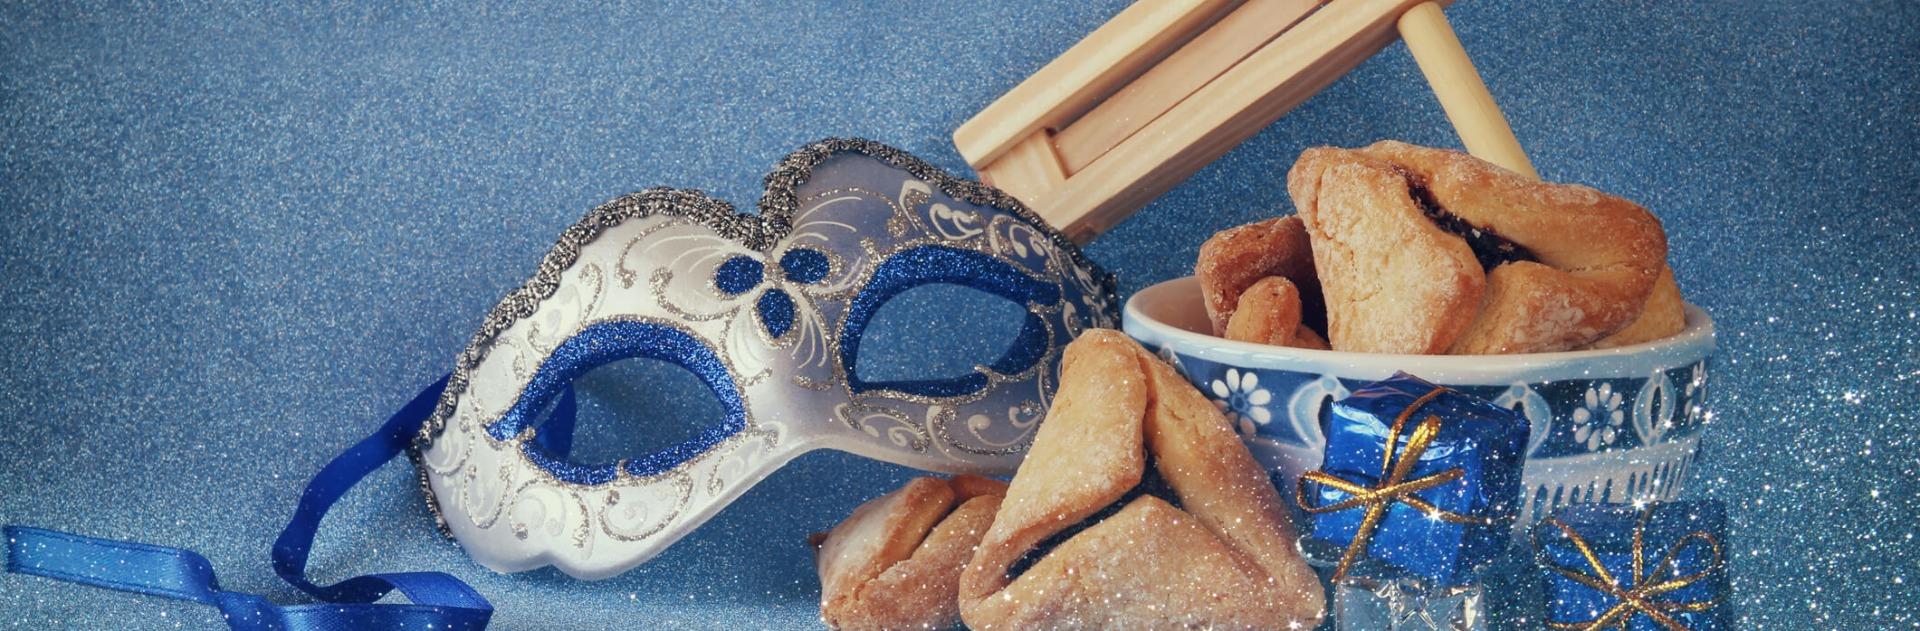 Purim Gift Baskets Fabyan